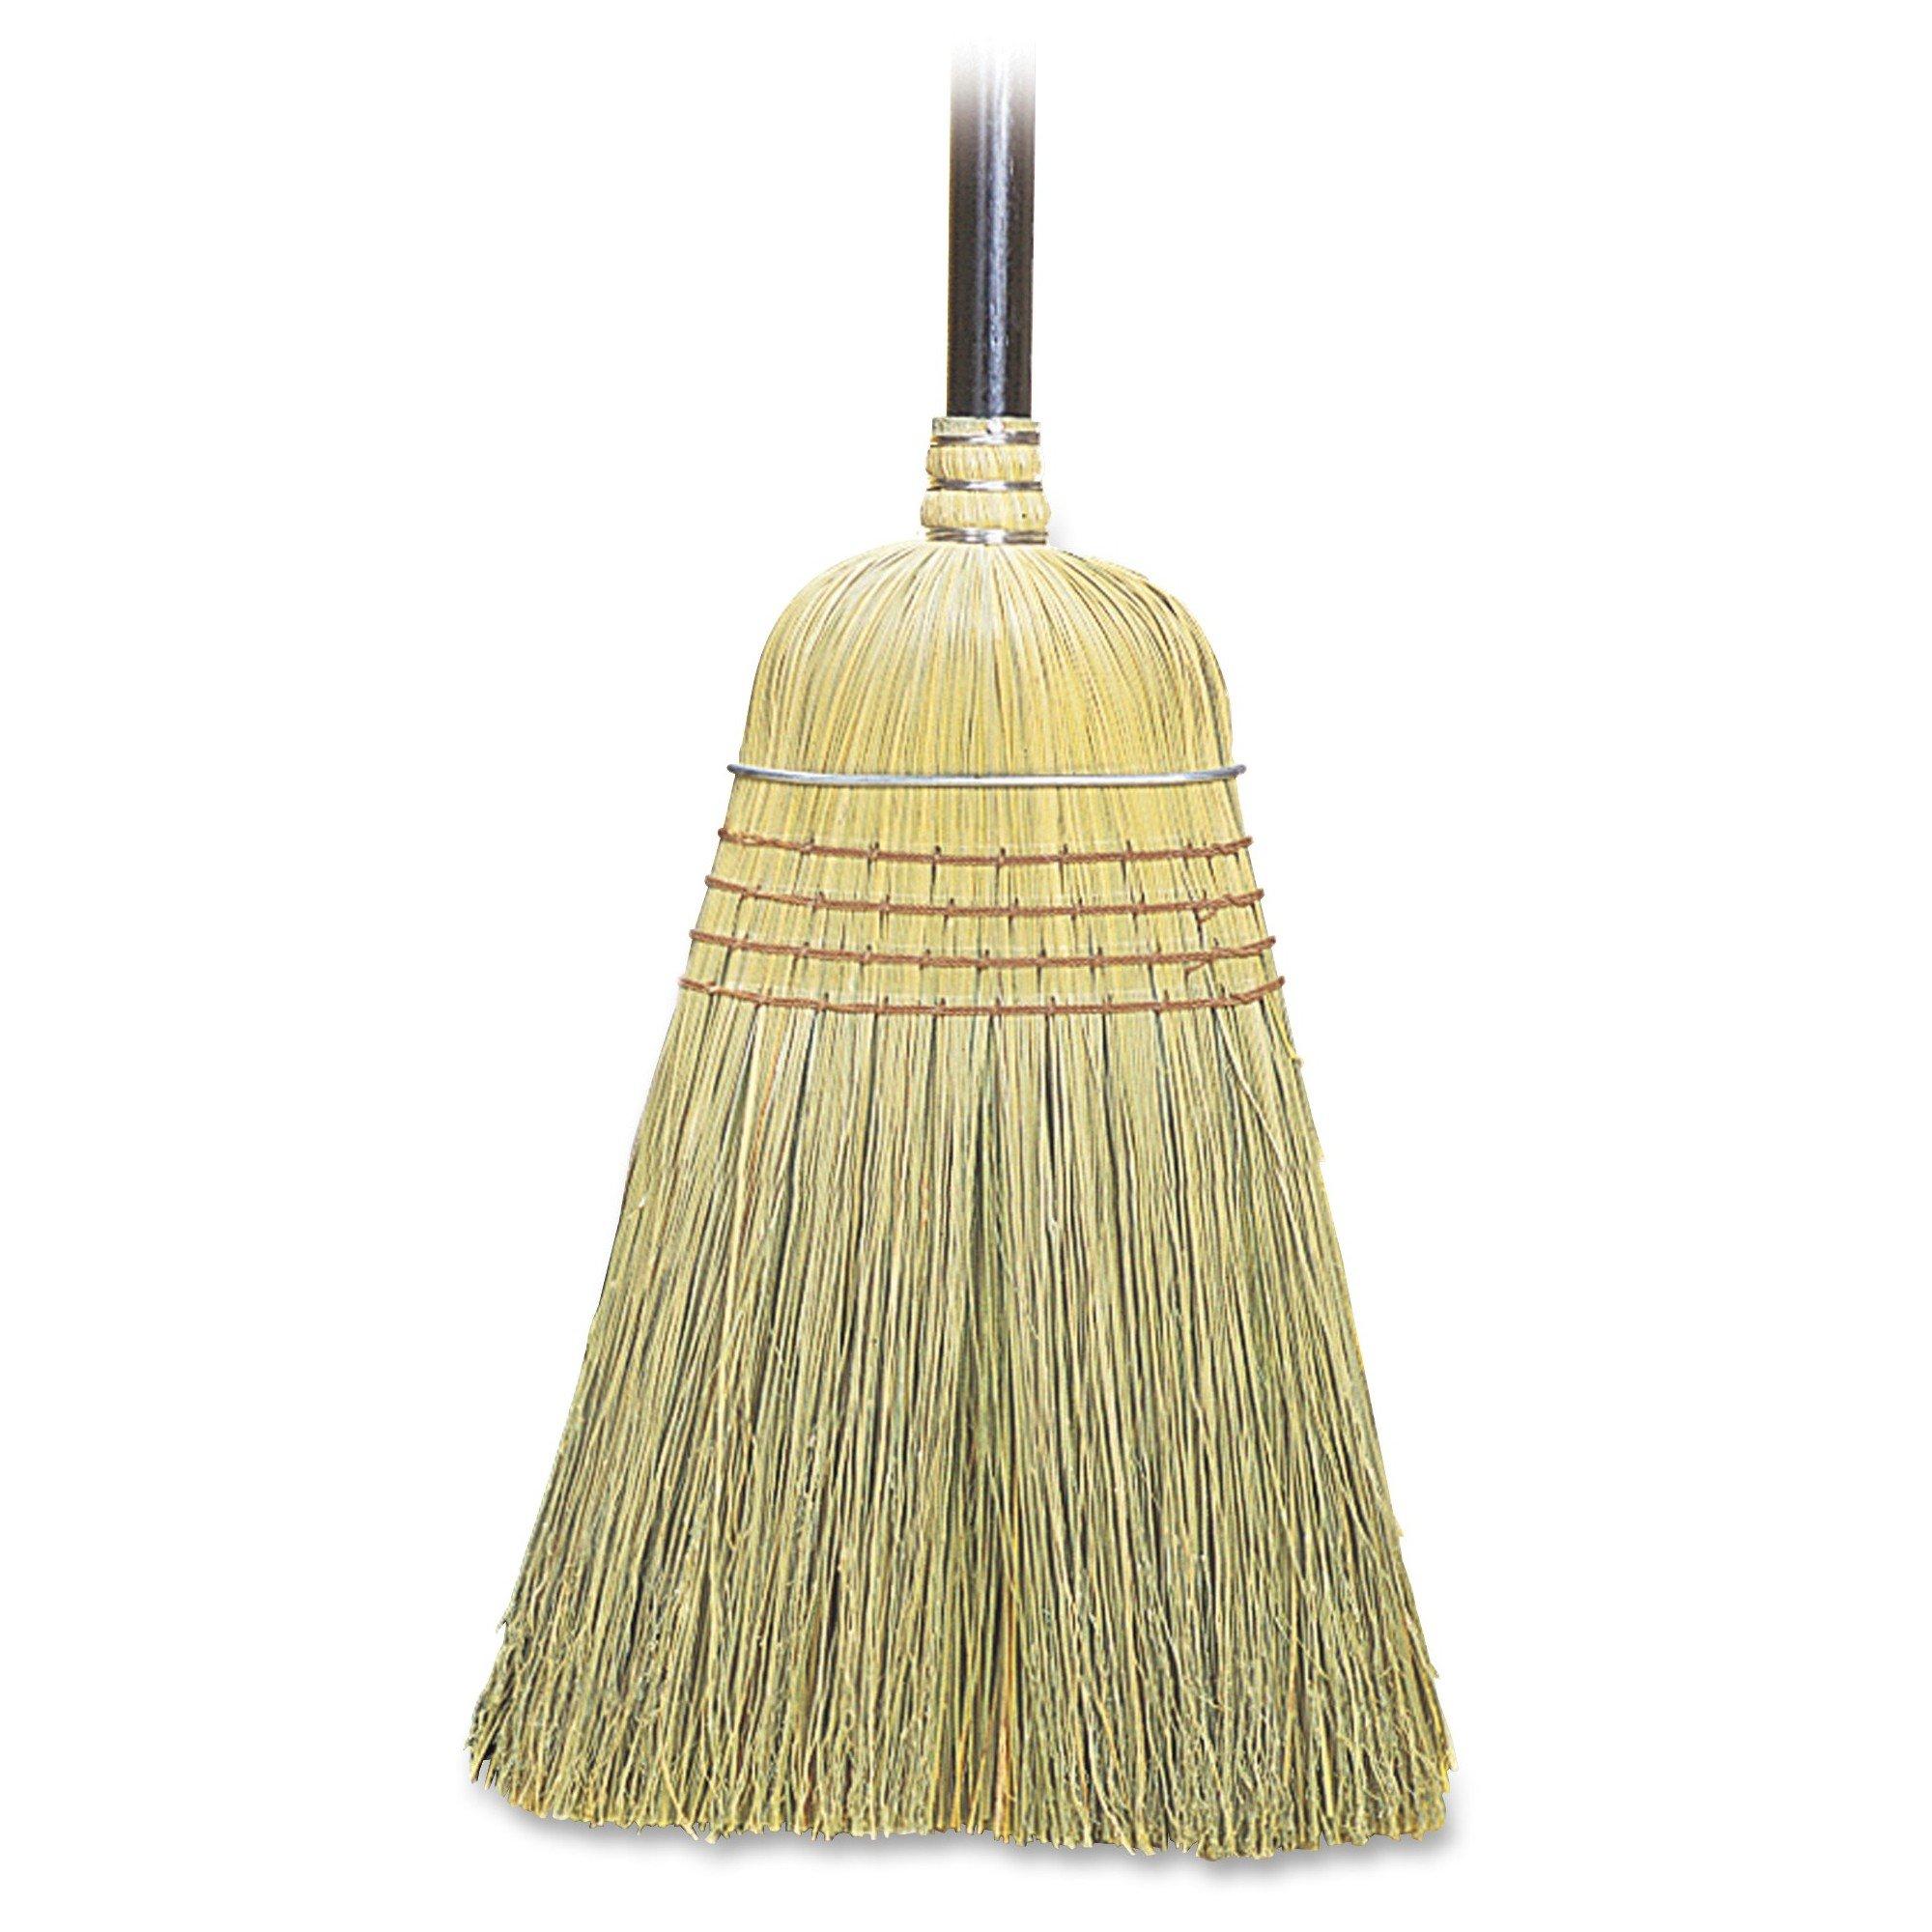 12001CT Genuine Joe Warehouse Broom